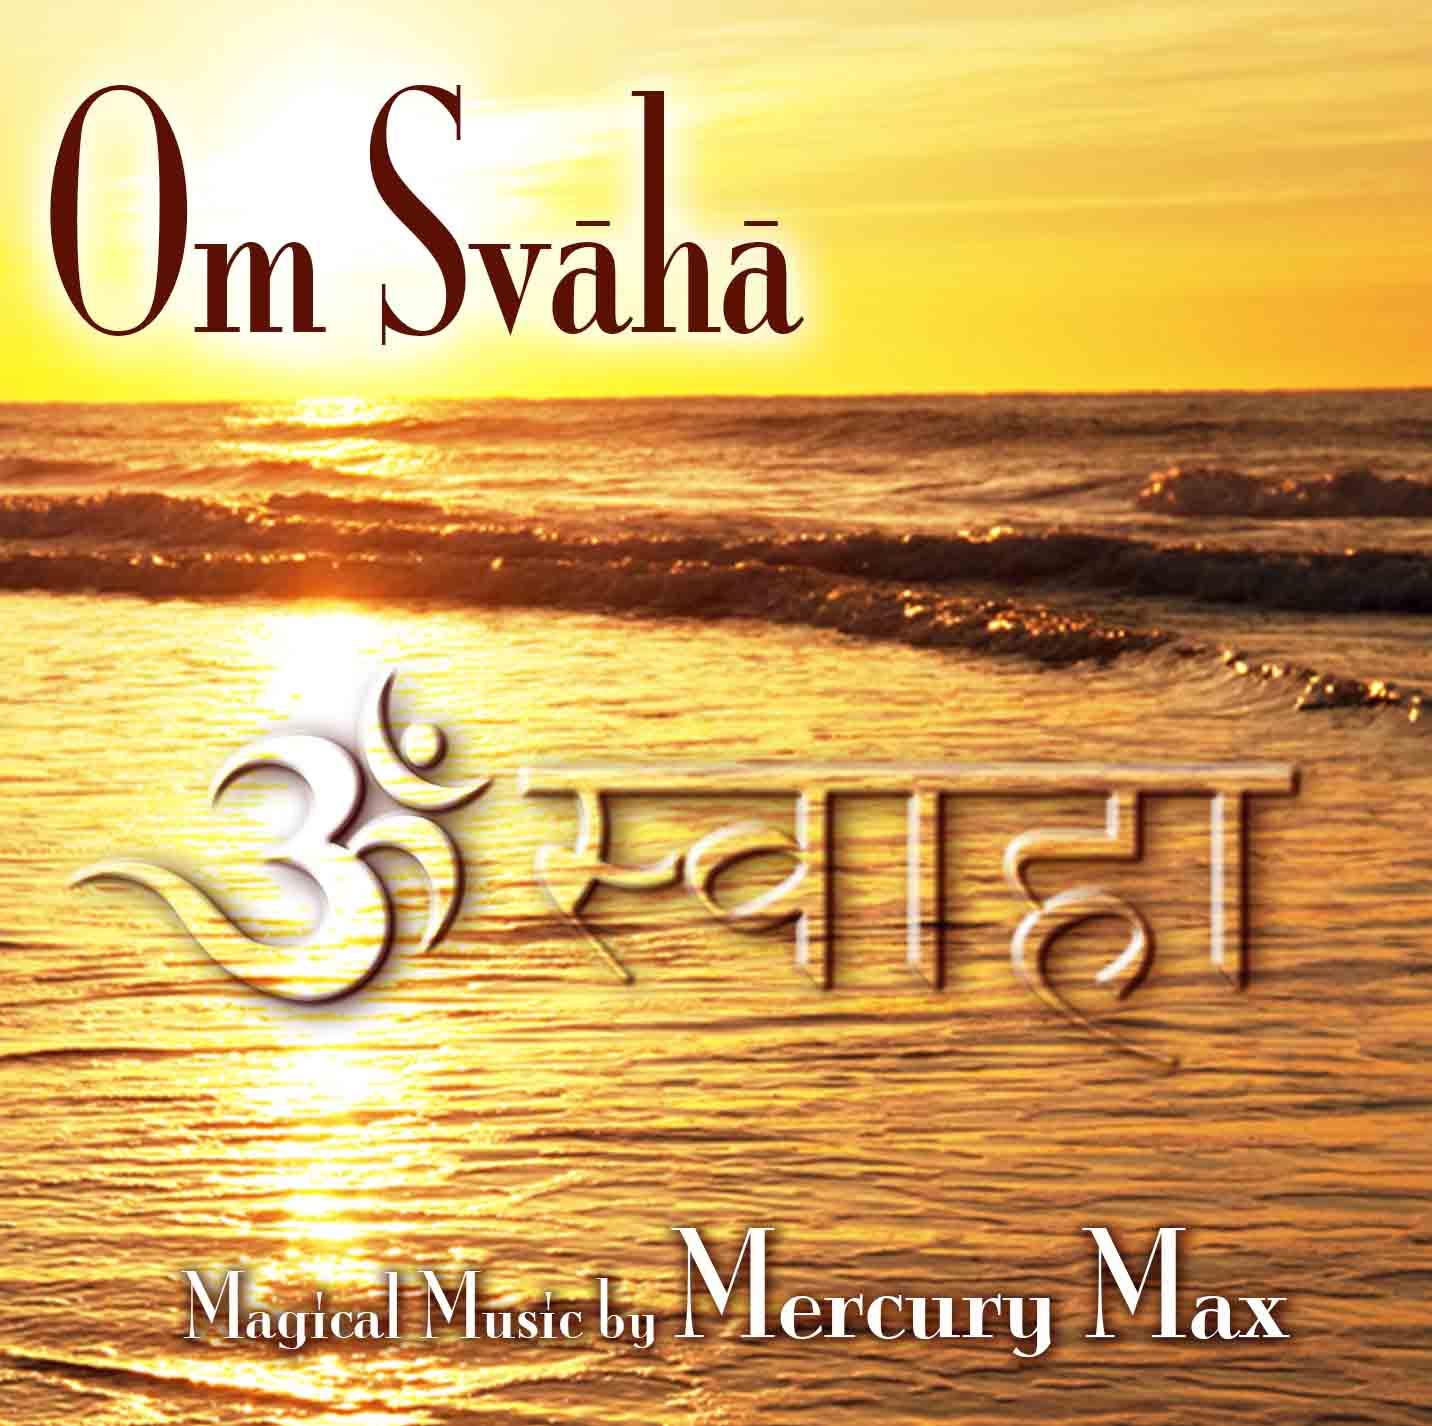 OM Svaha CD by Mercury Max